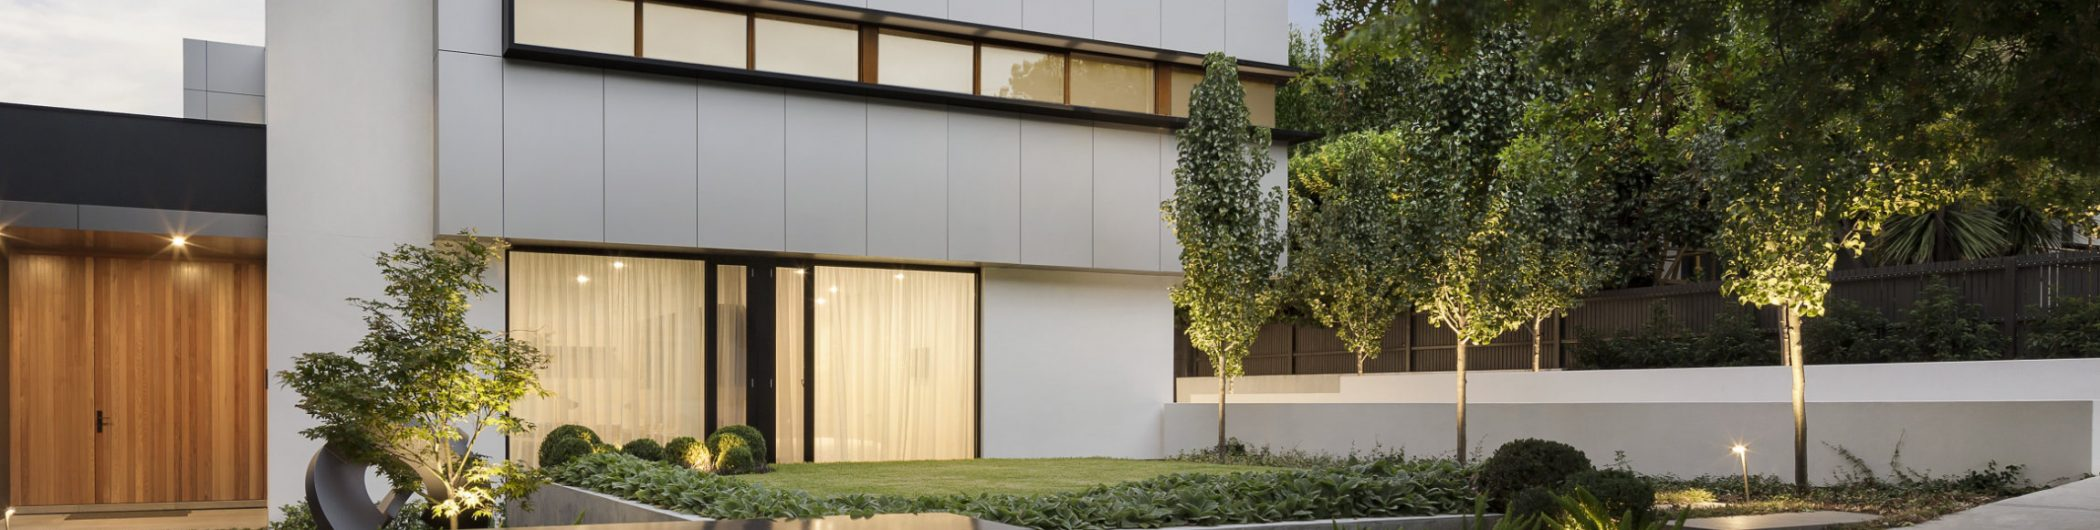 modern-house-exterior-E3A7NAJ-1.jpg